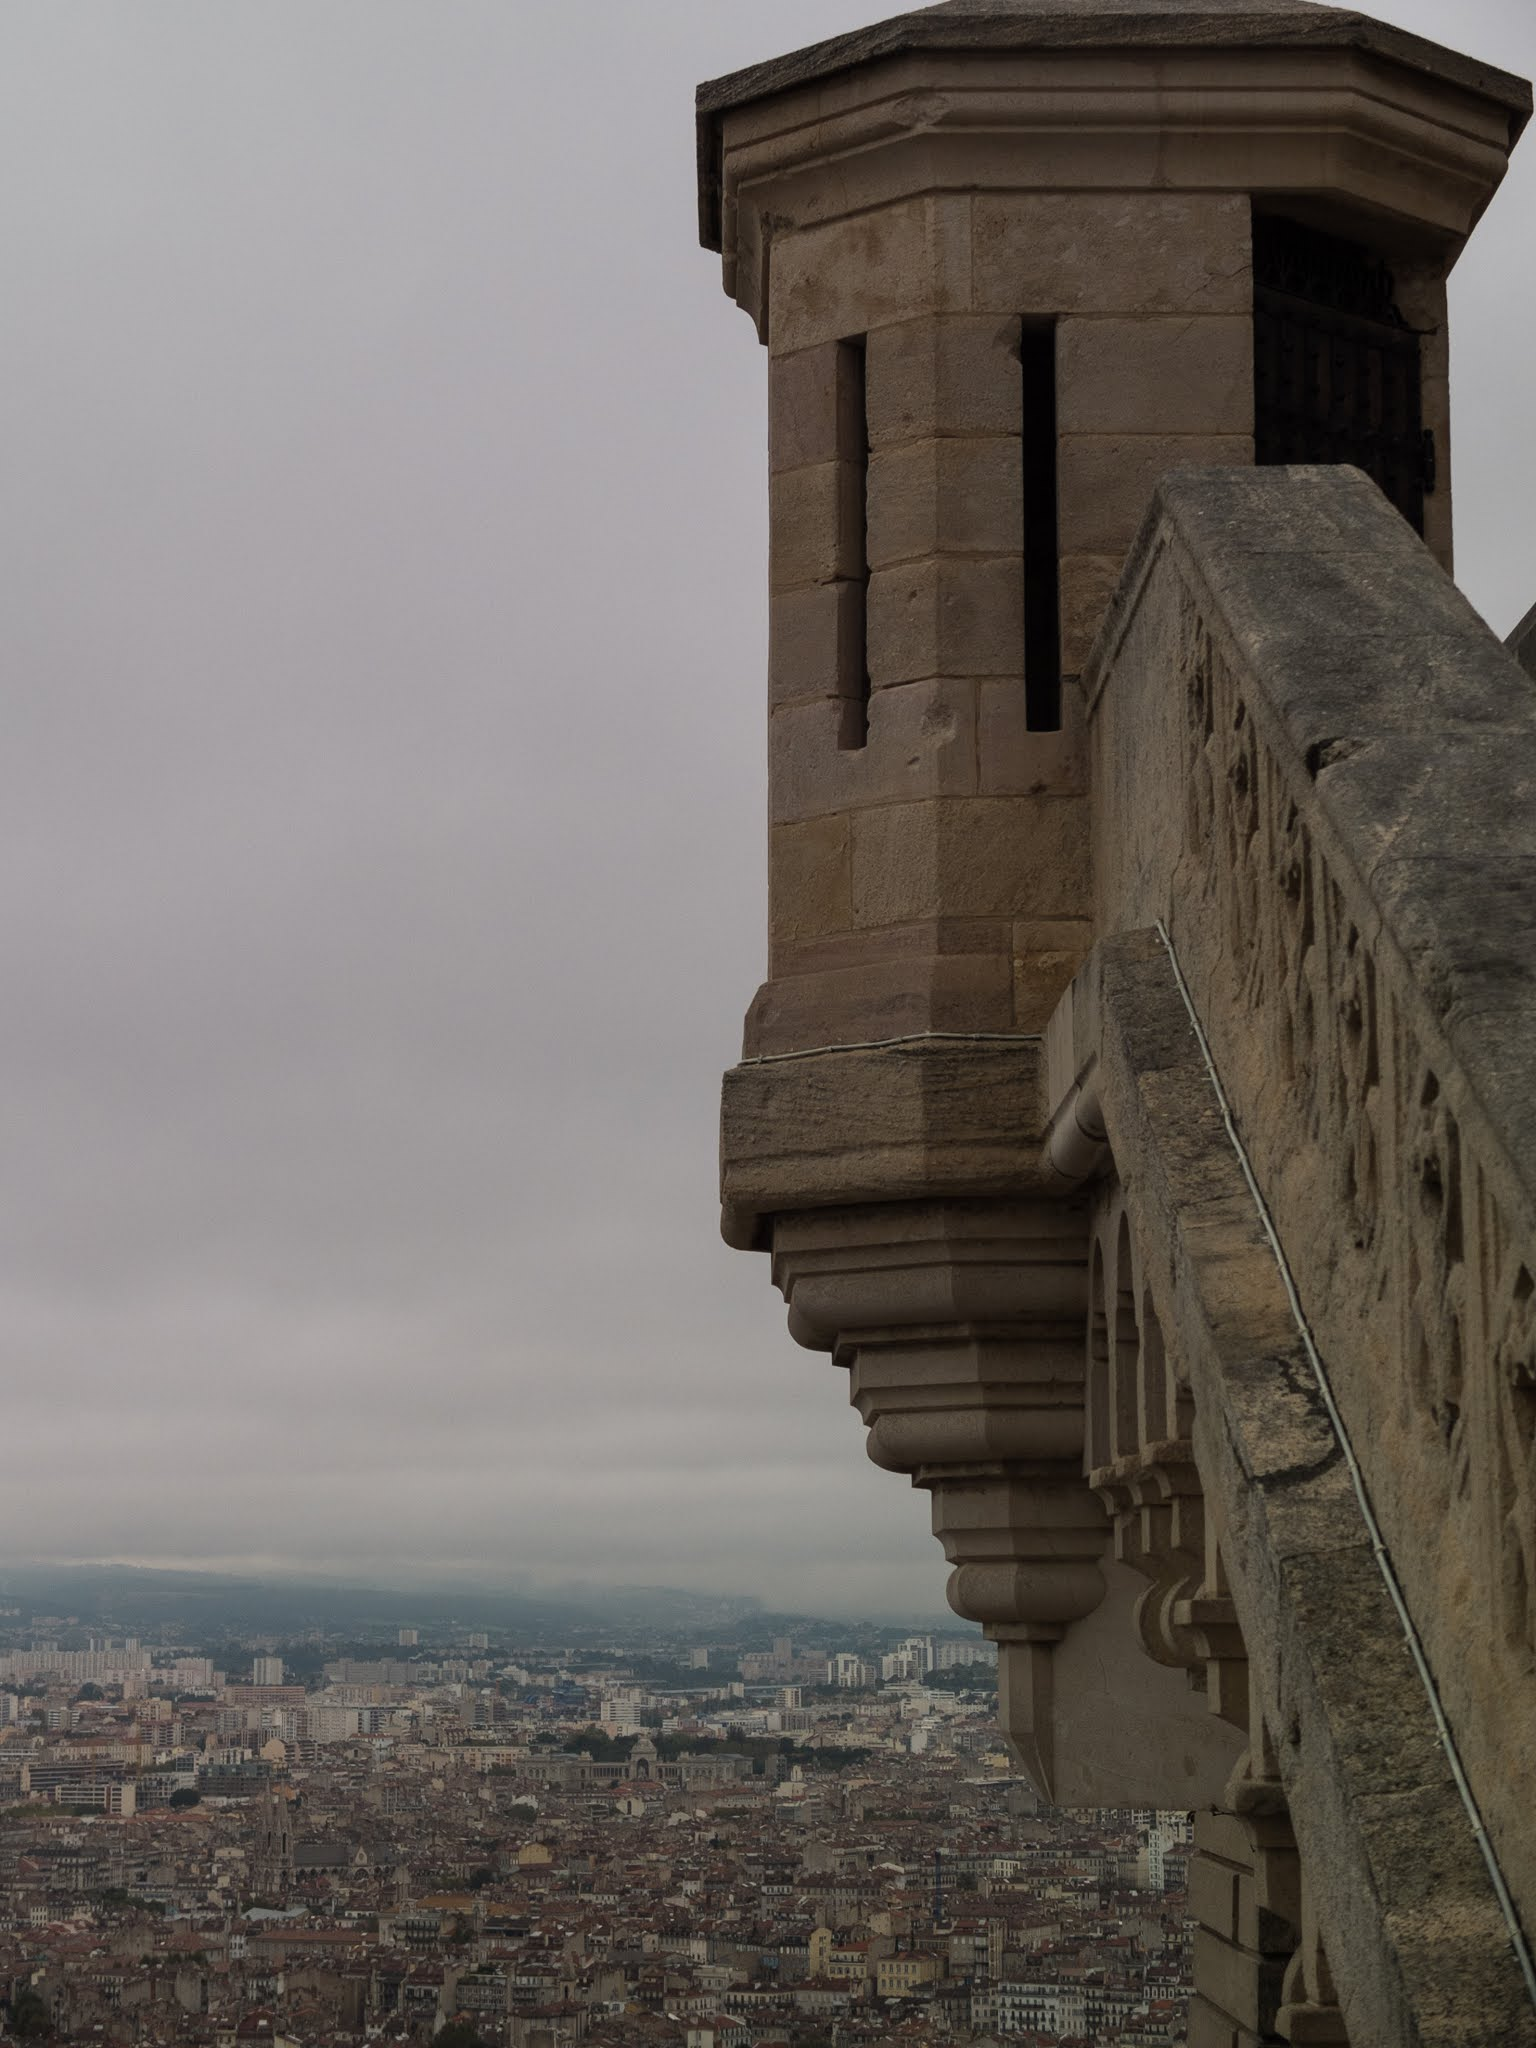 View of Marseille from the Basilica of Notre Dame de la Garde.